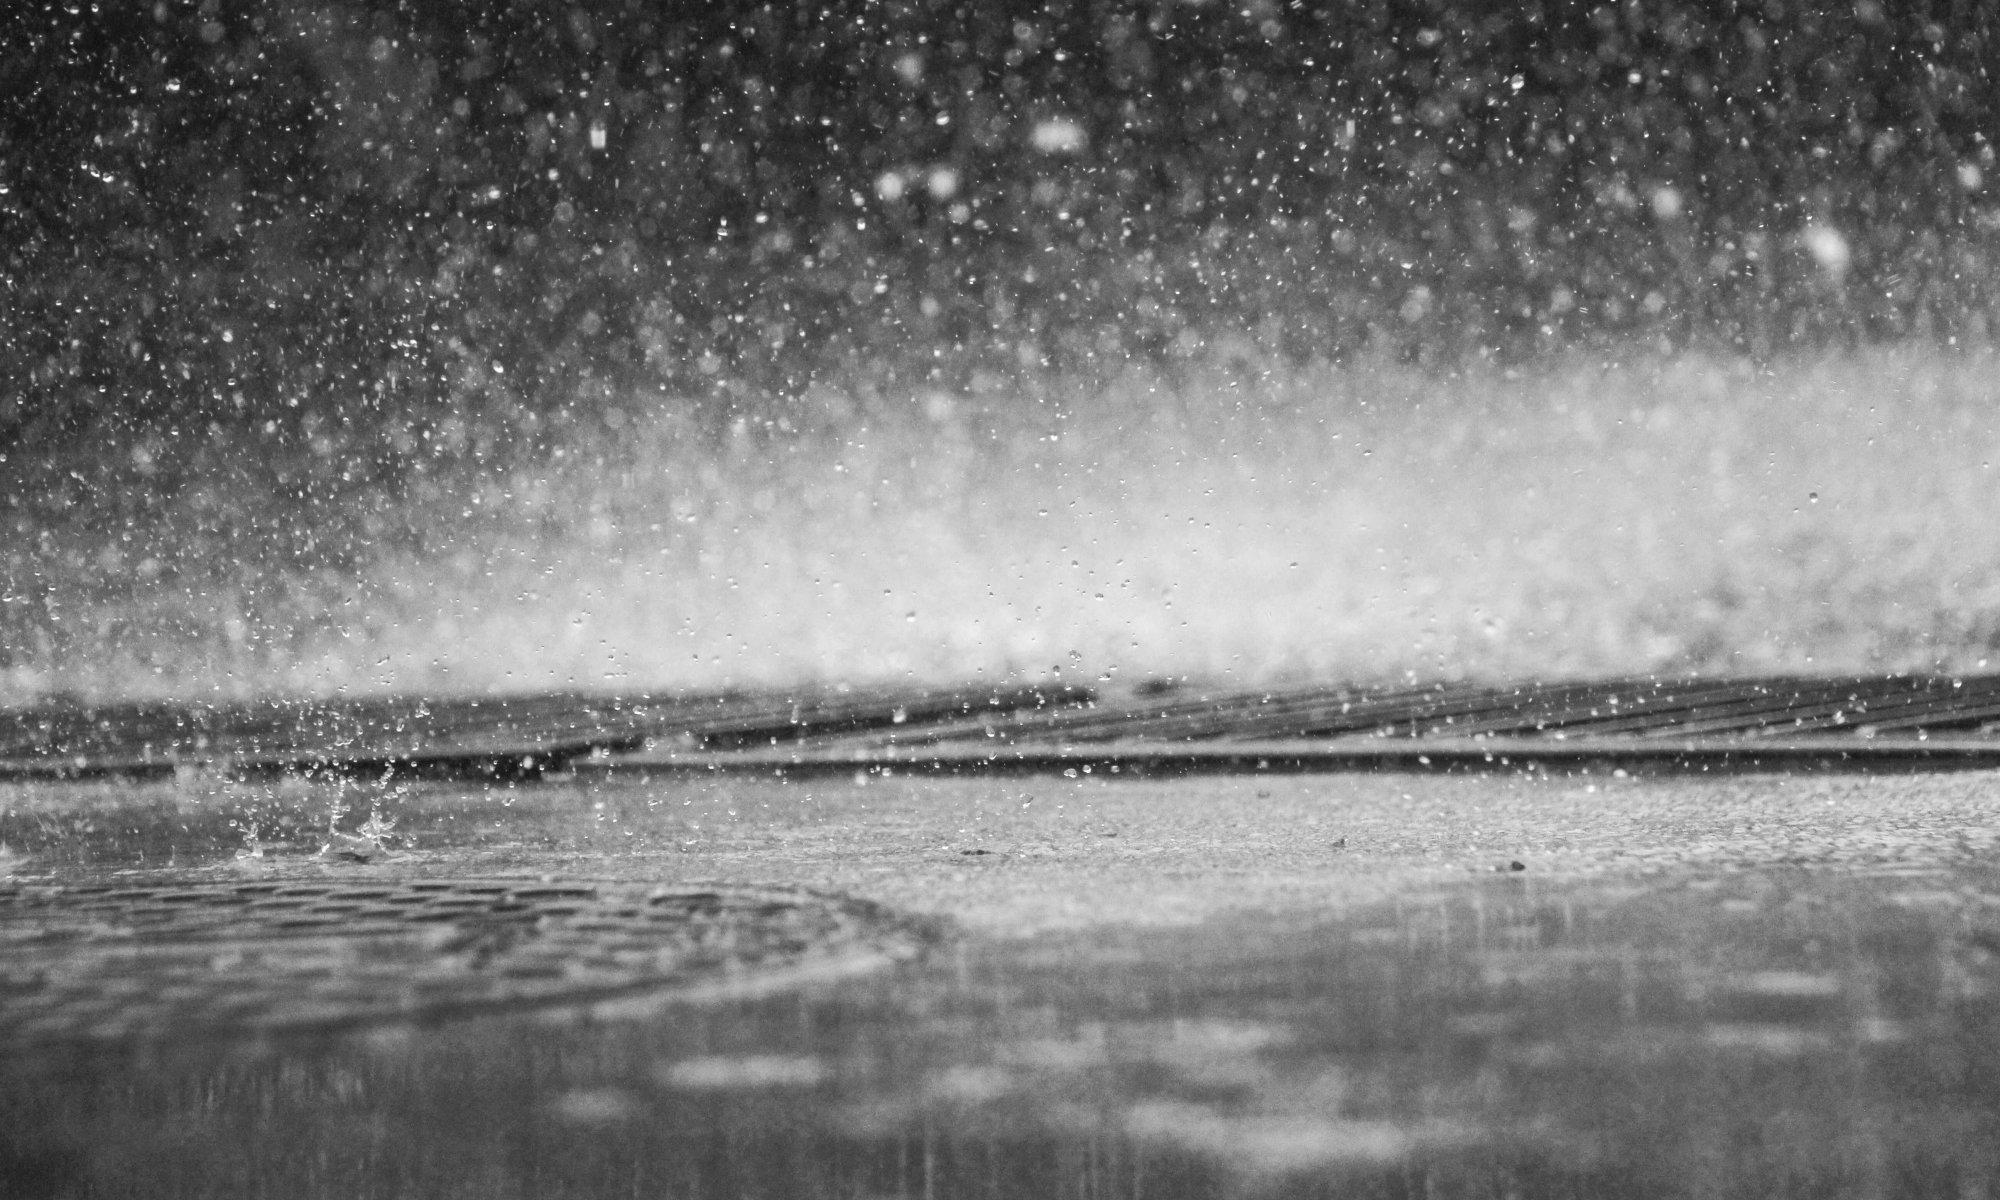 Viel Regen prasselt vom Himmel. © www.unsplash.com, Eutah Mizushima